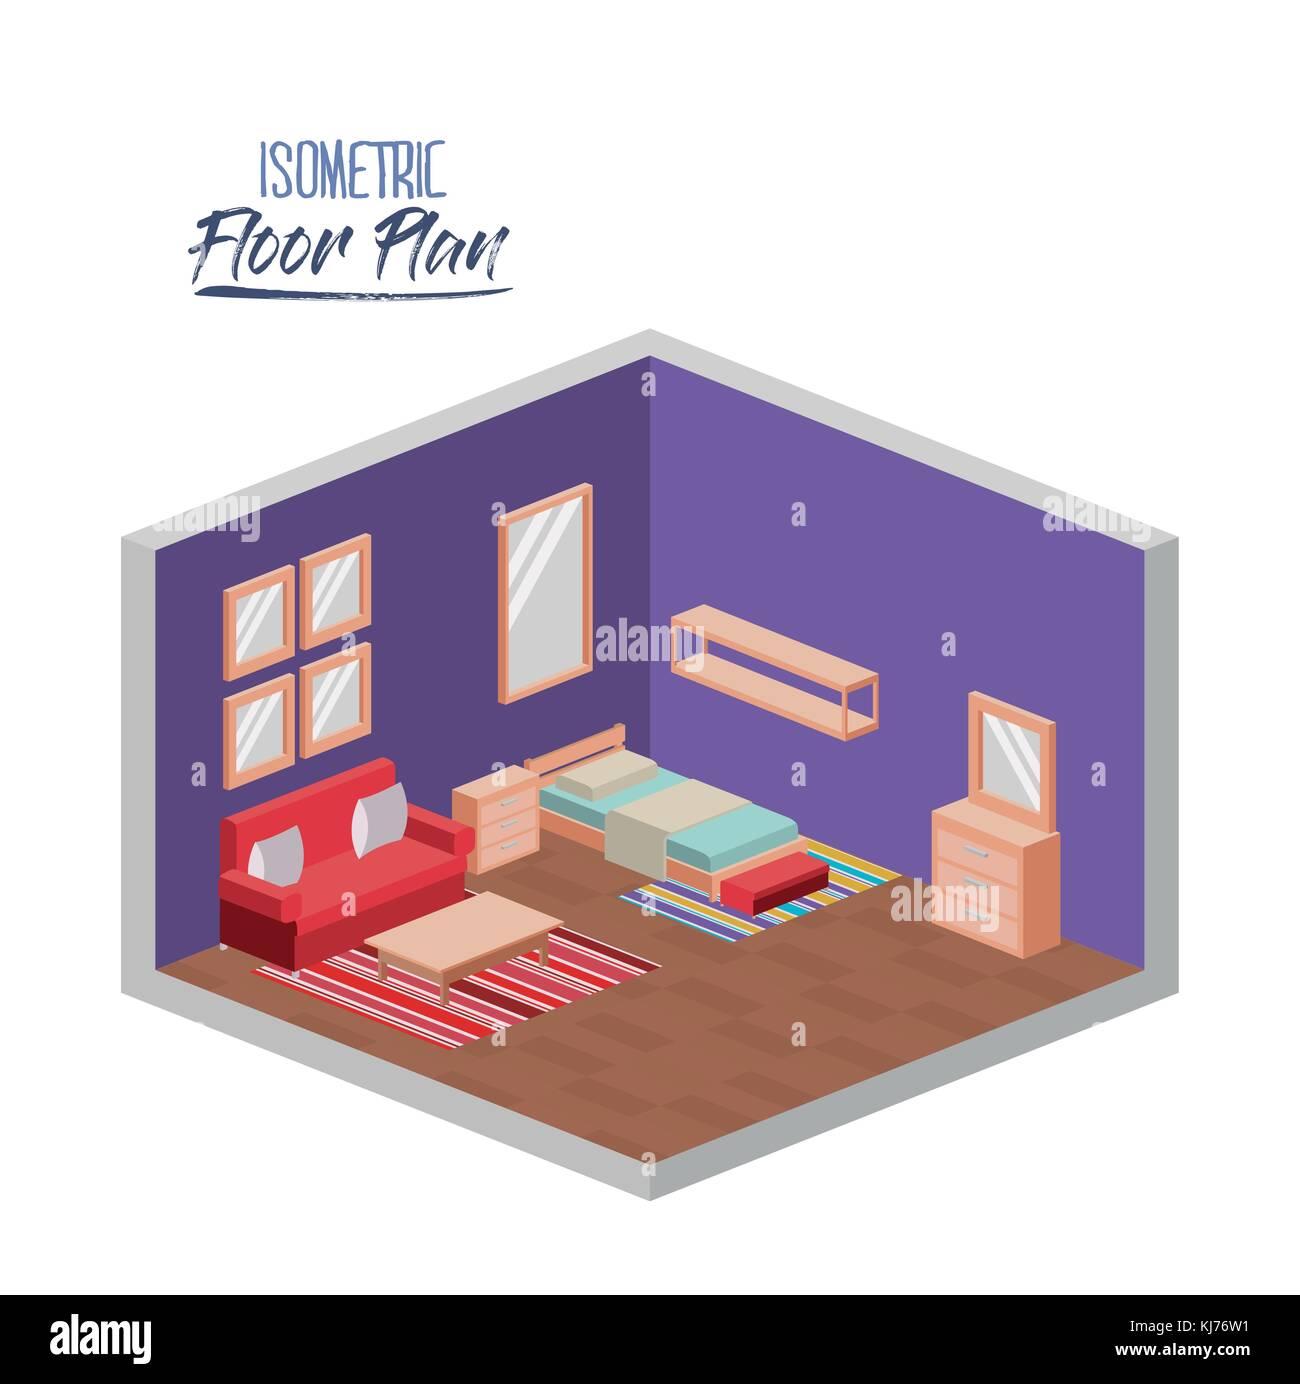 3d Floor Plan Isometric: Cutaway House Illustration Stock Photos & Cutaway House